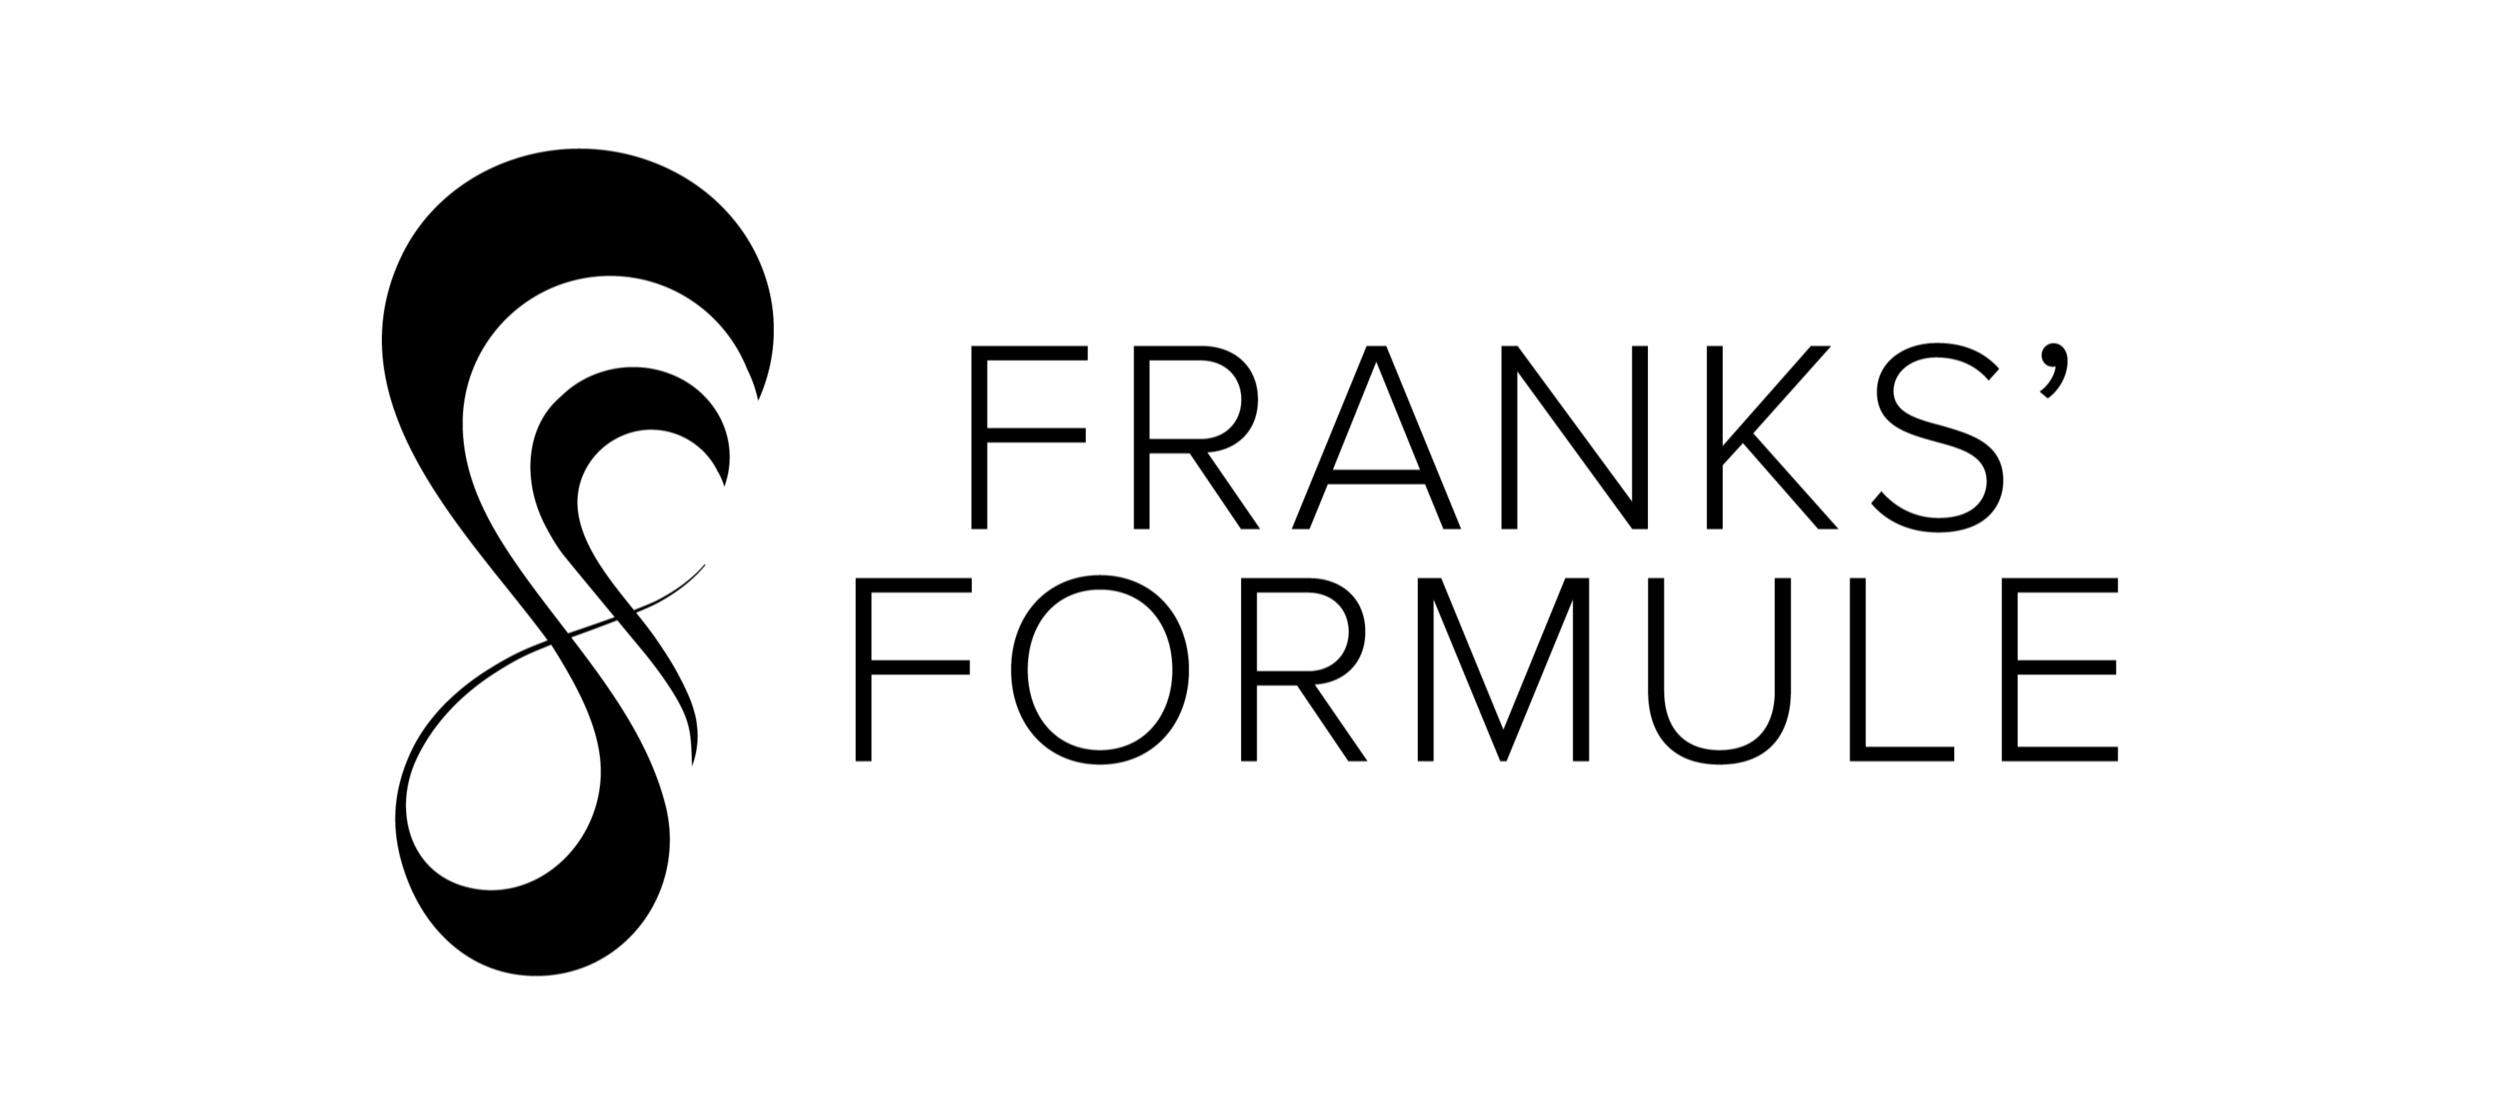 FranksFormule-_LogoLockupLandscape-Black.jpg